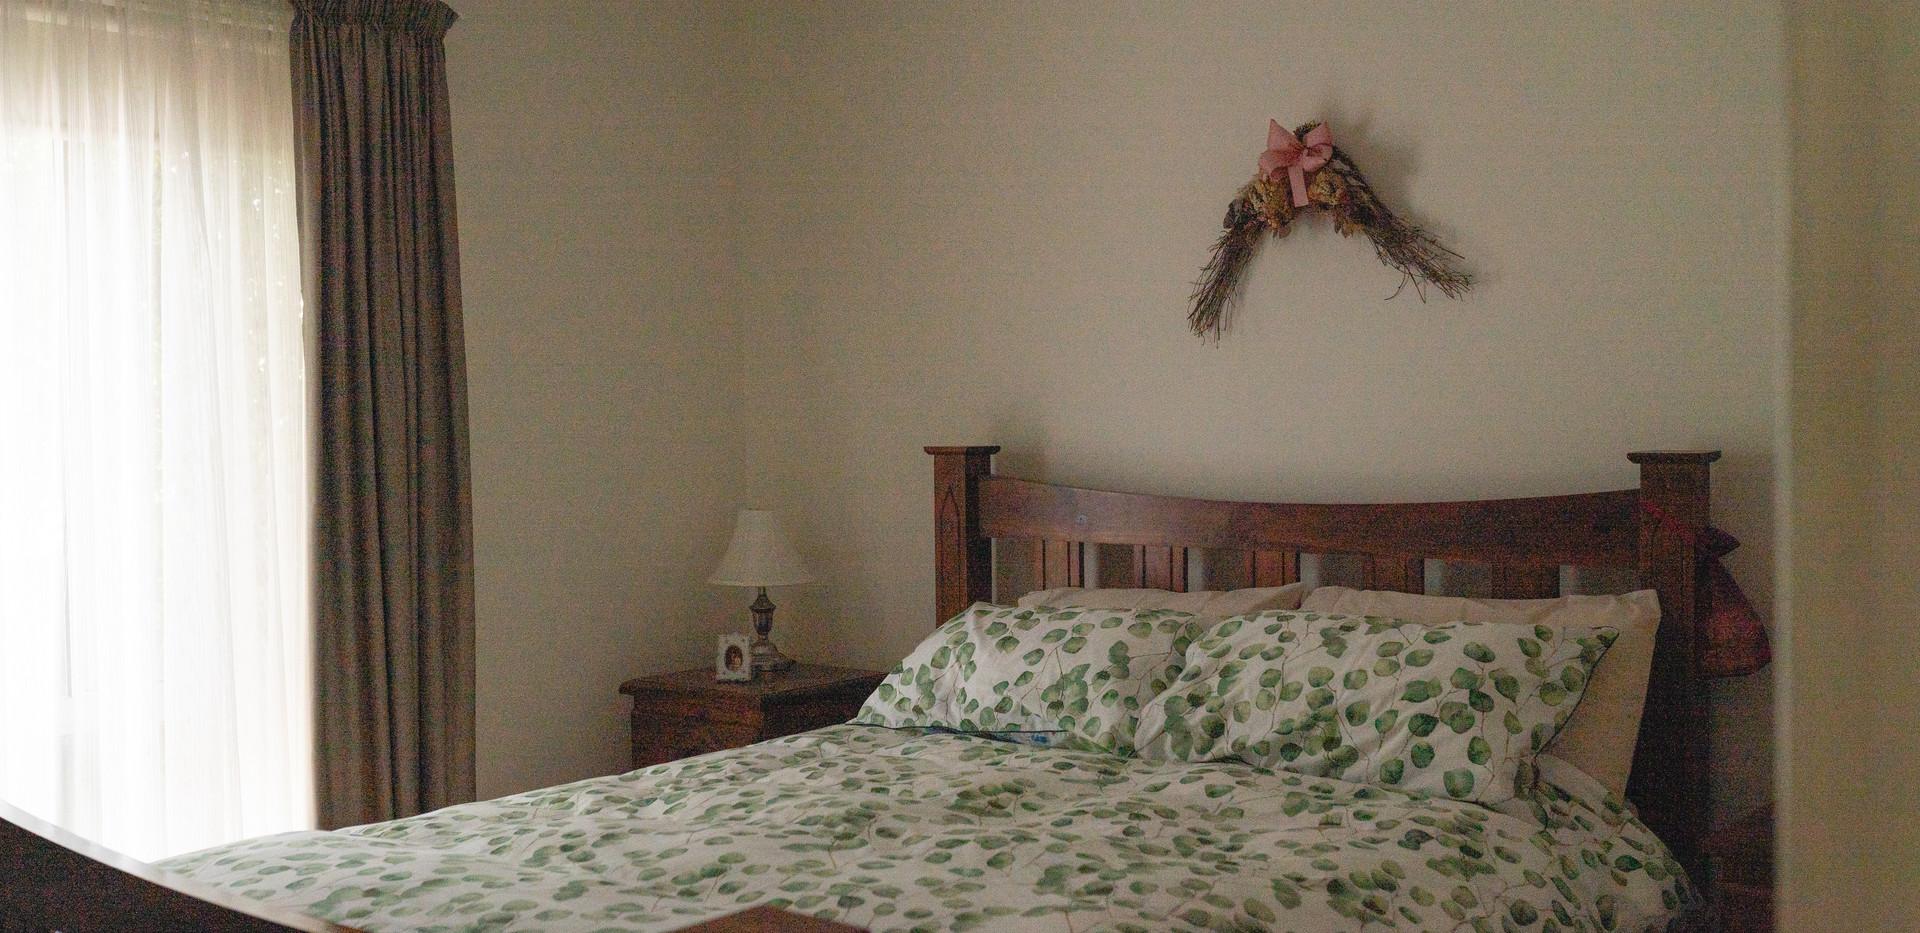 Unit 57 Bedroom 2